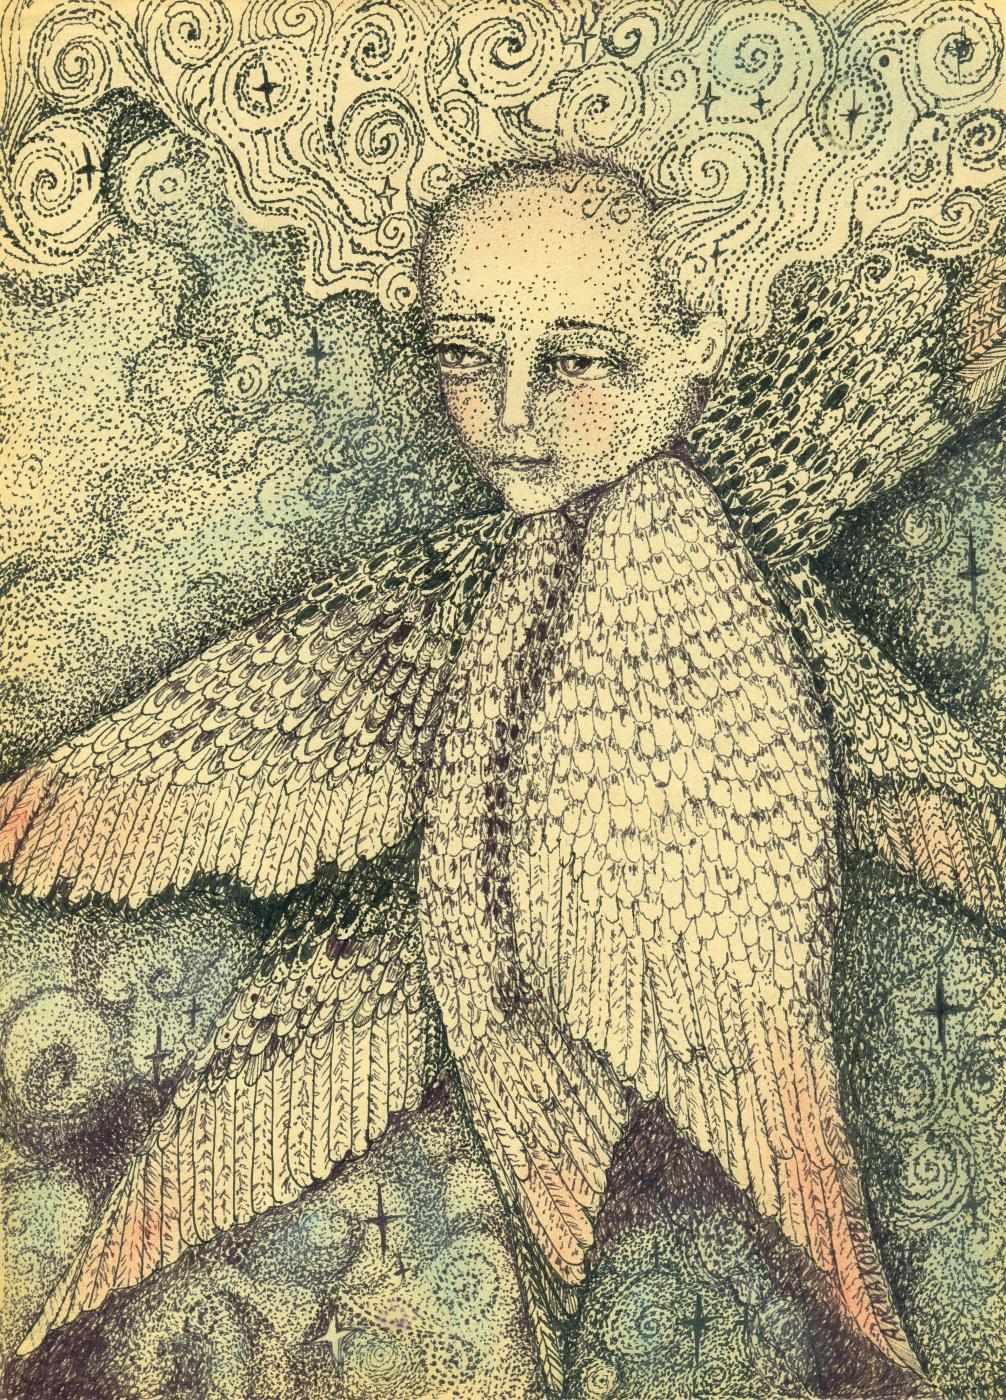 Olyona Ivanovna Koneva. Angel. Space